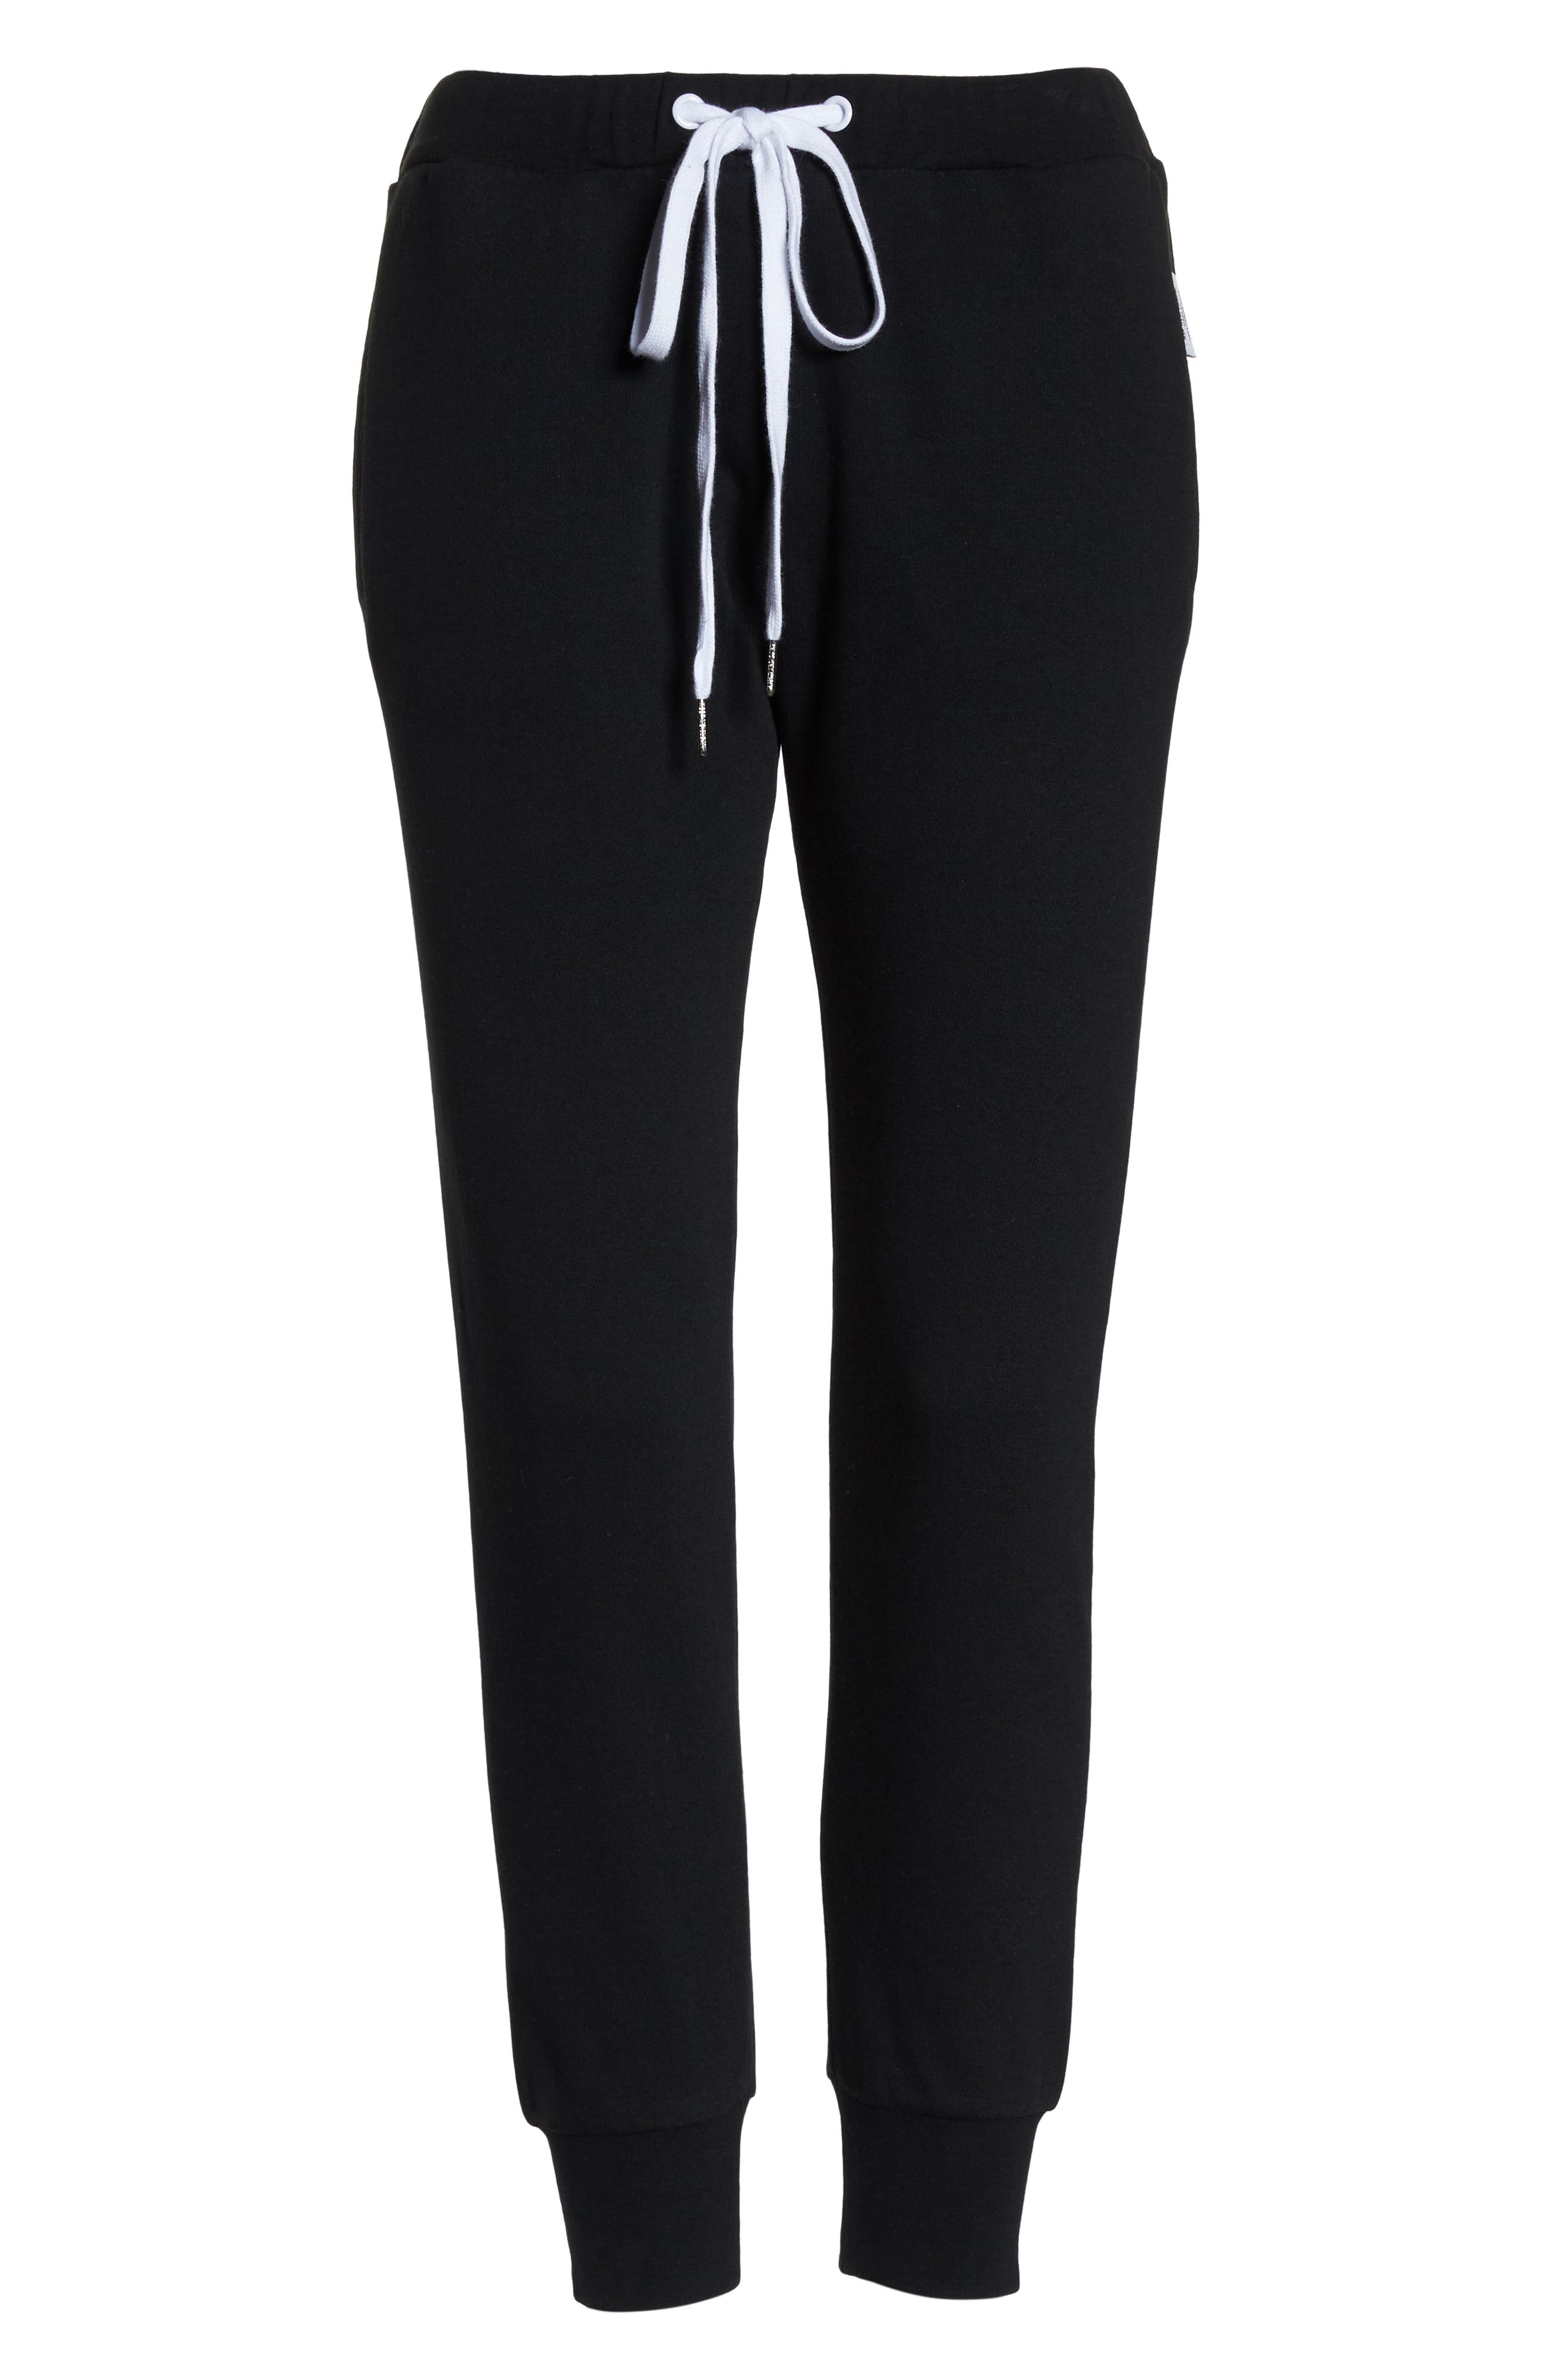 Lounge Pants,                             Alternate thumbnail 6, color,                             BLACK